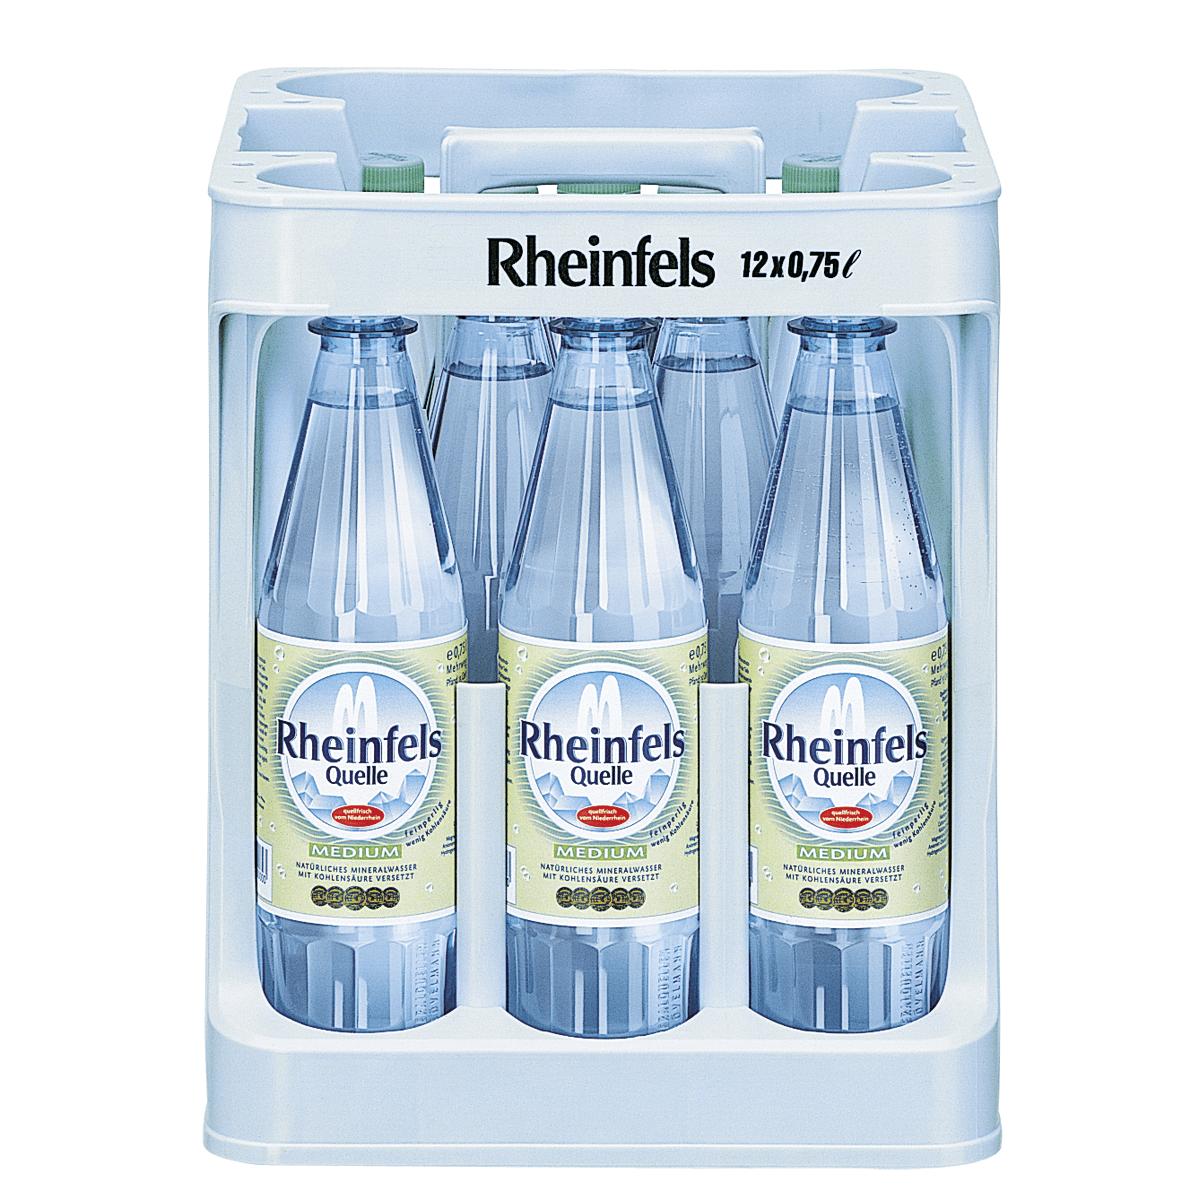 Rheinfels Quelle Medium 12 x 0,75L   Wasser   Alkoholfreie Getränke ...